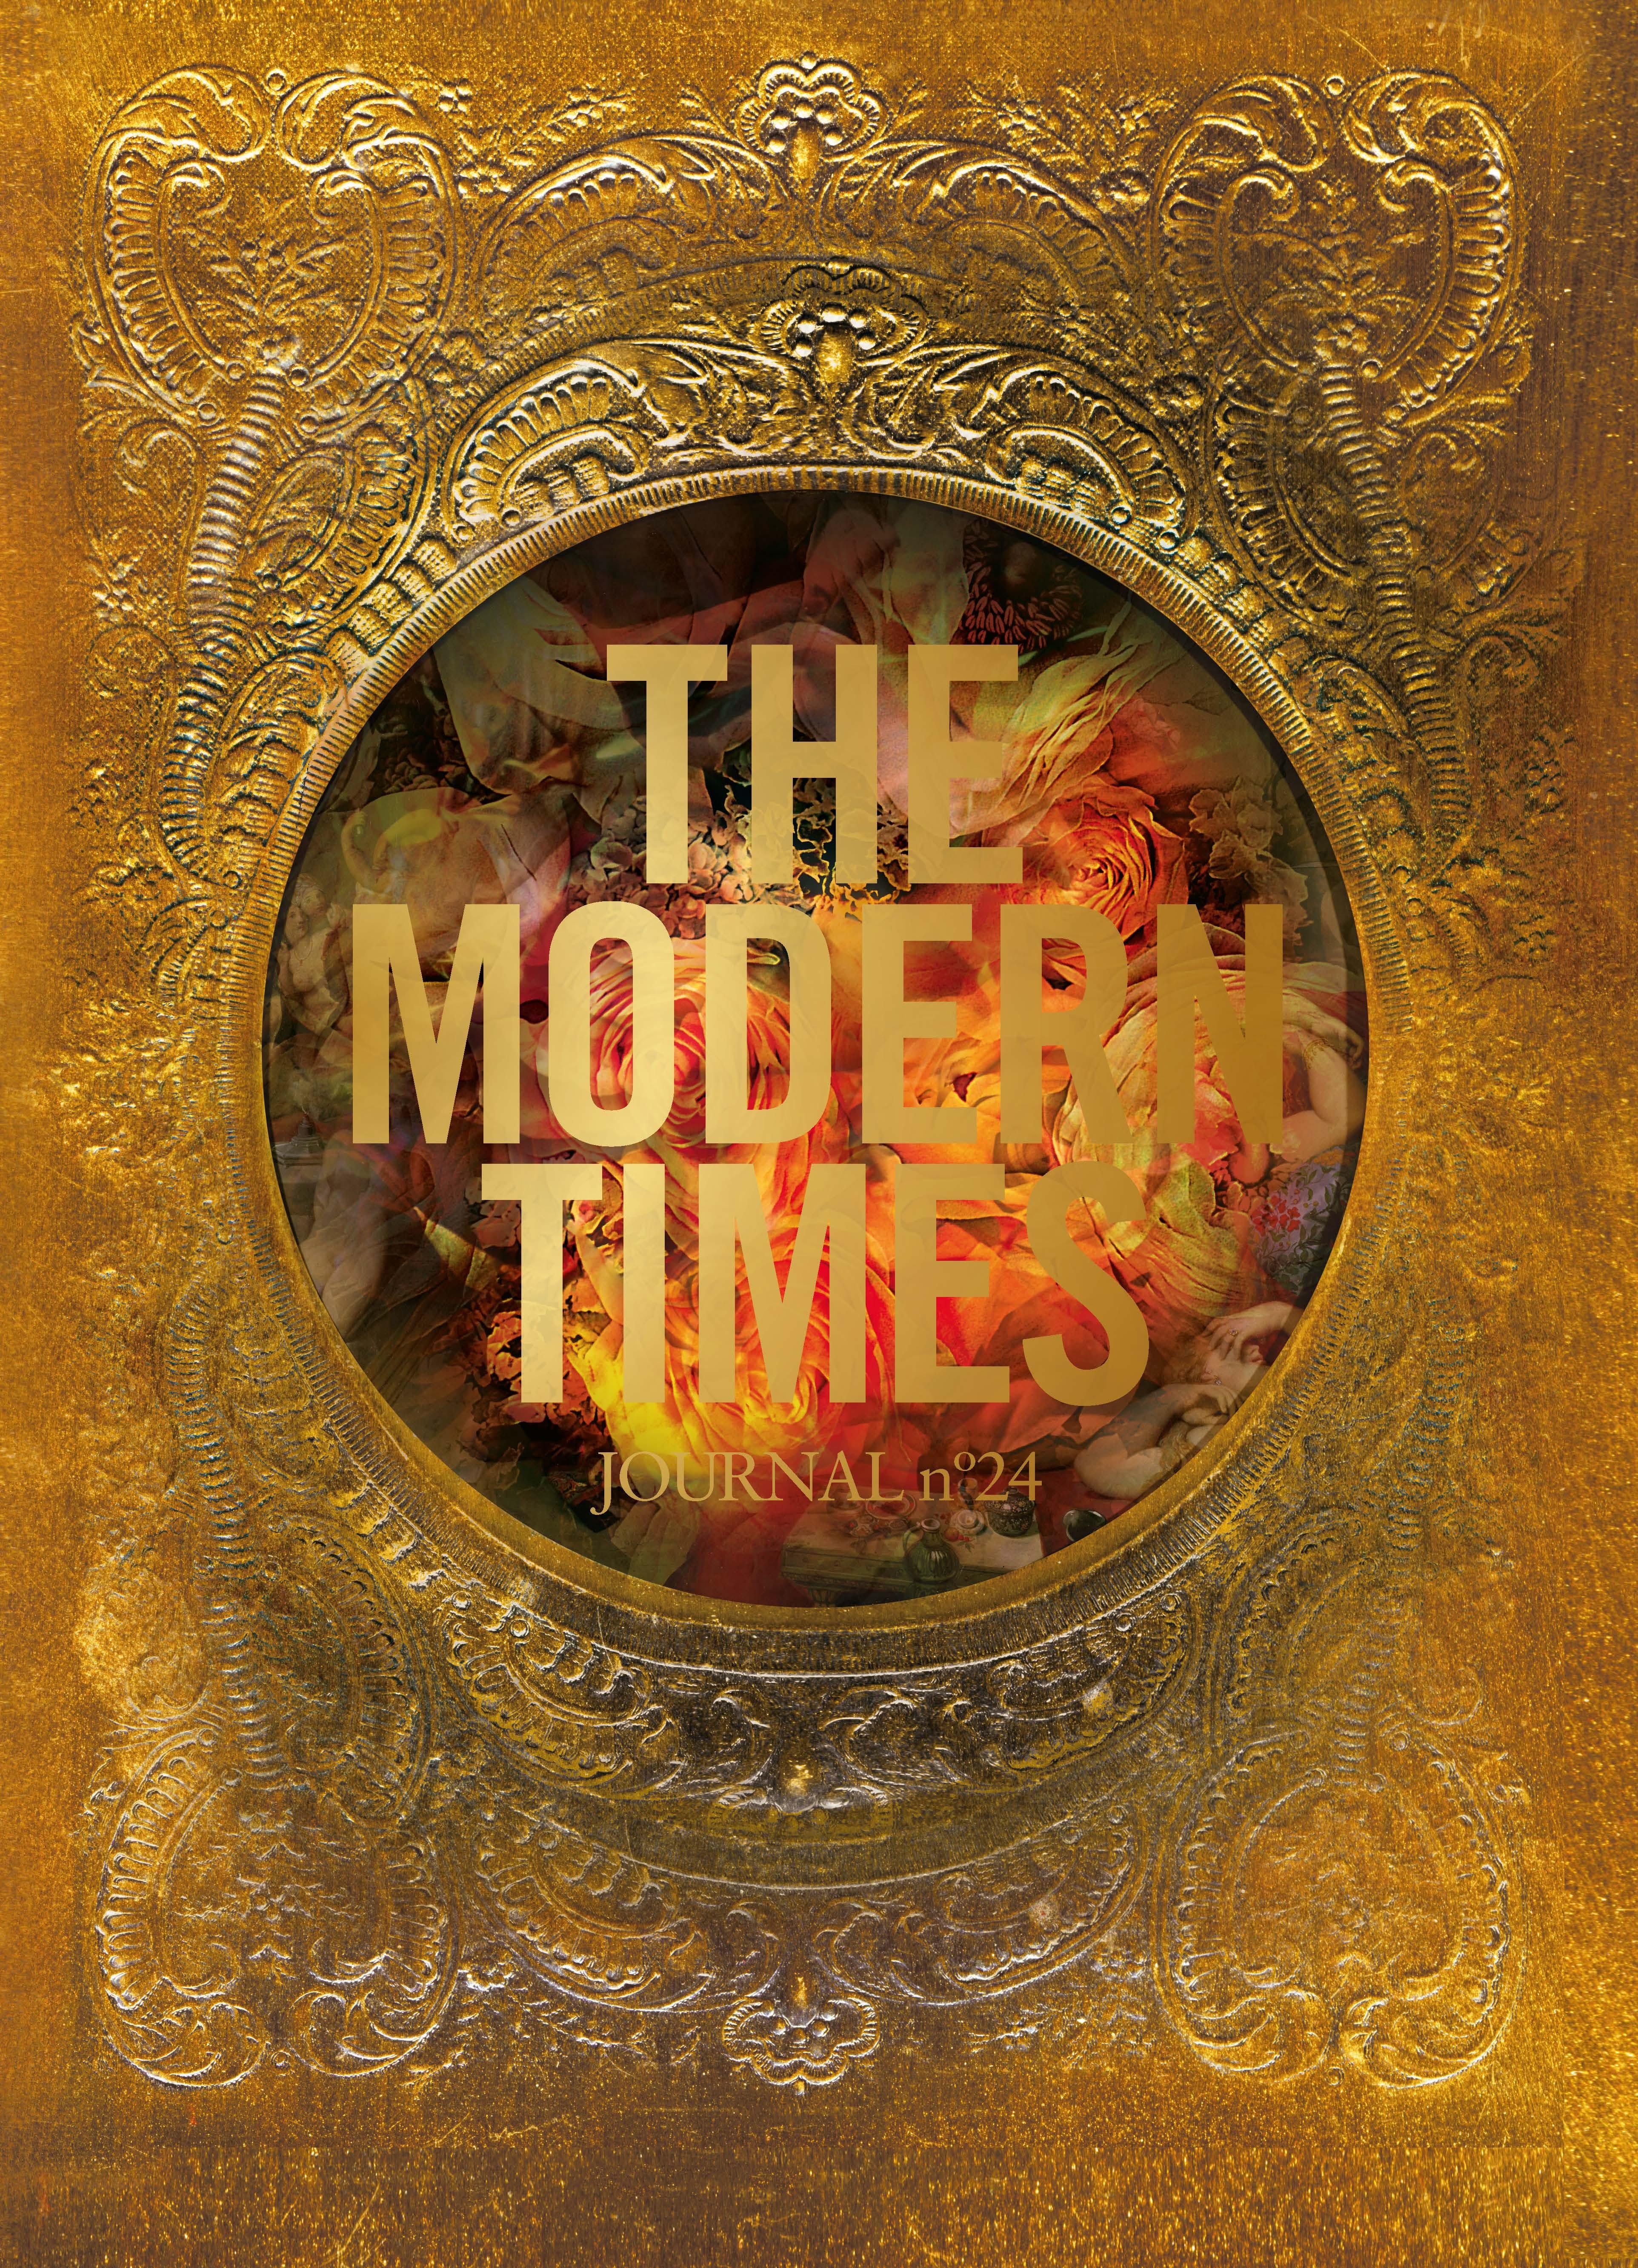 The Modern Times Journal N°24